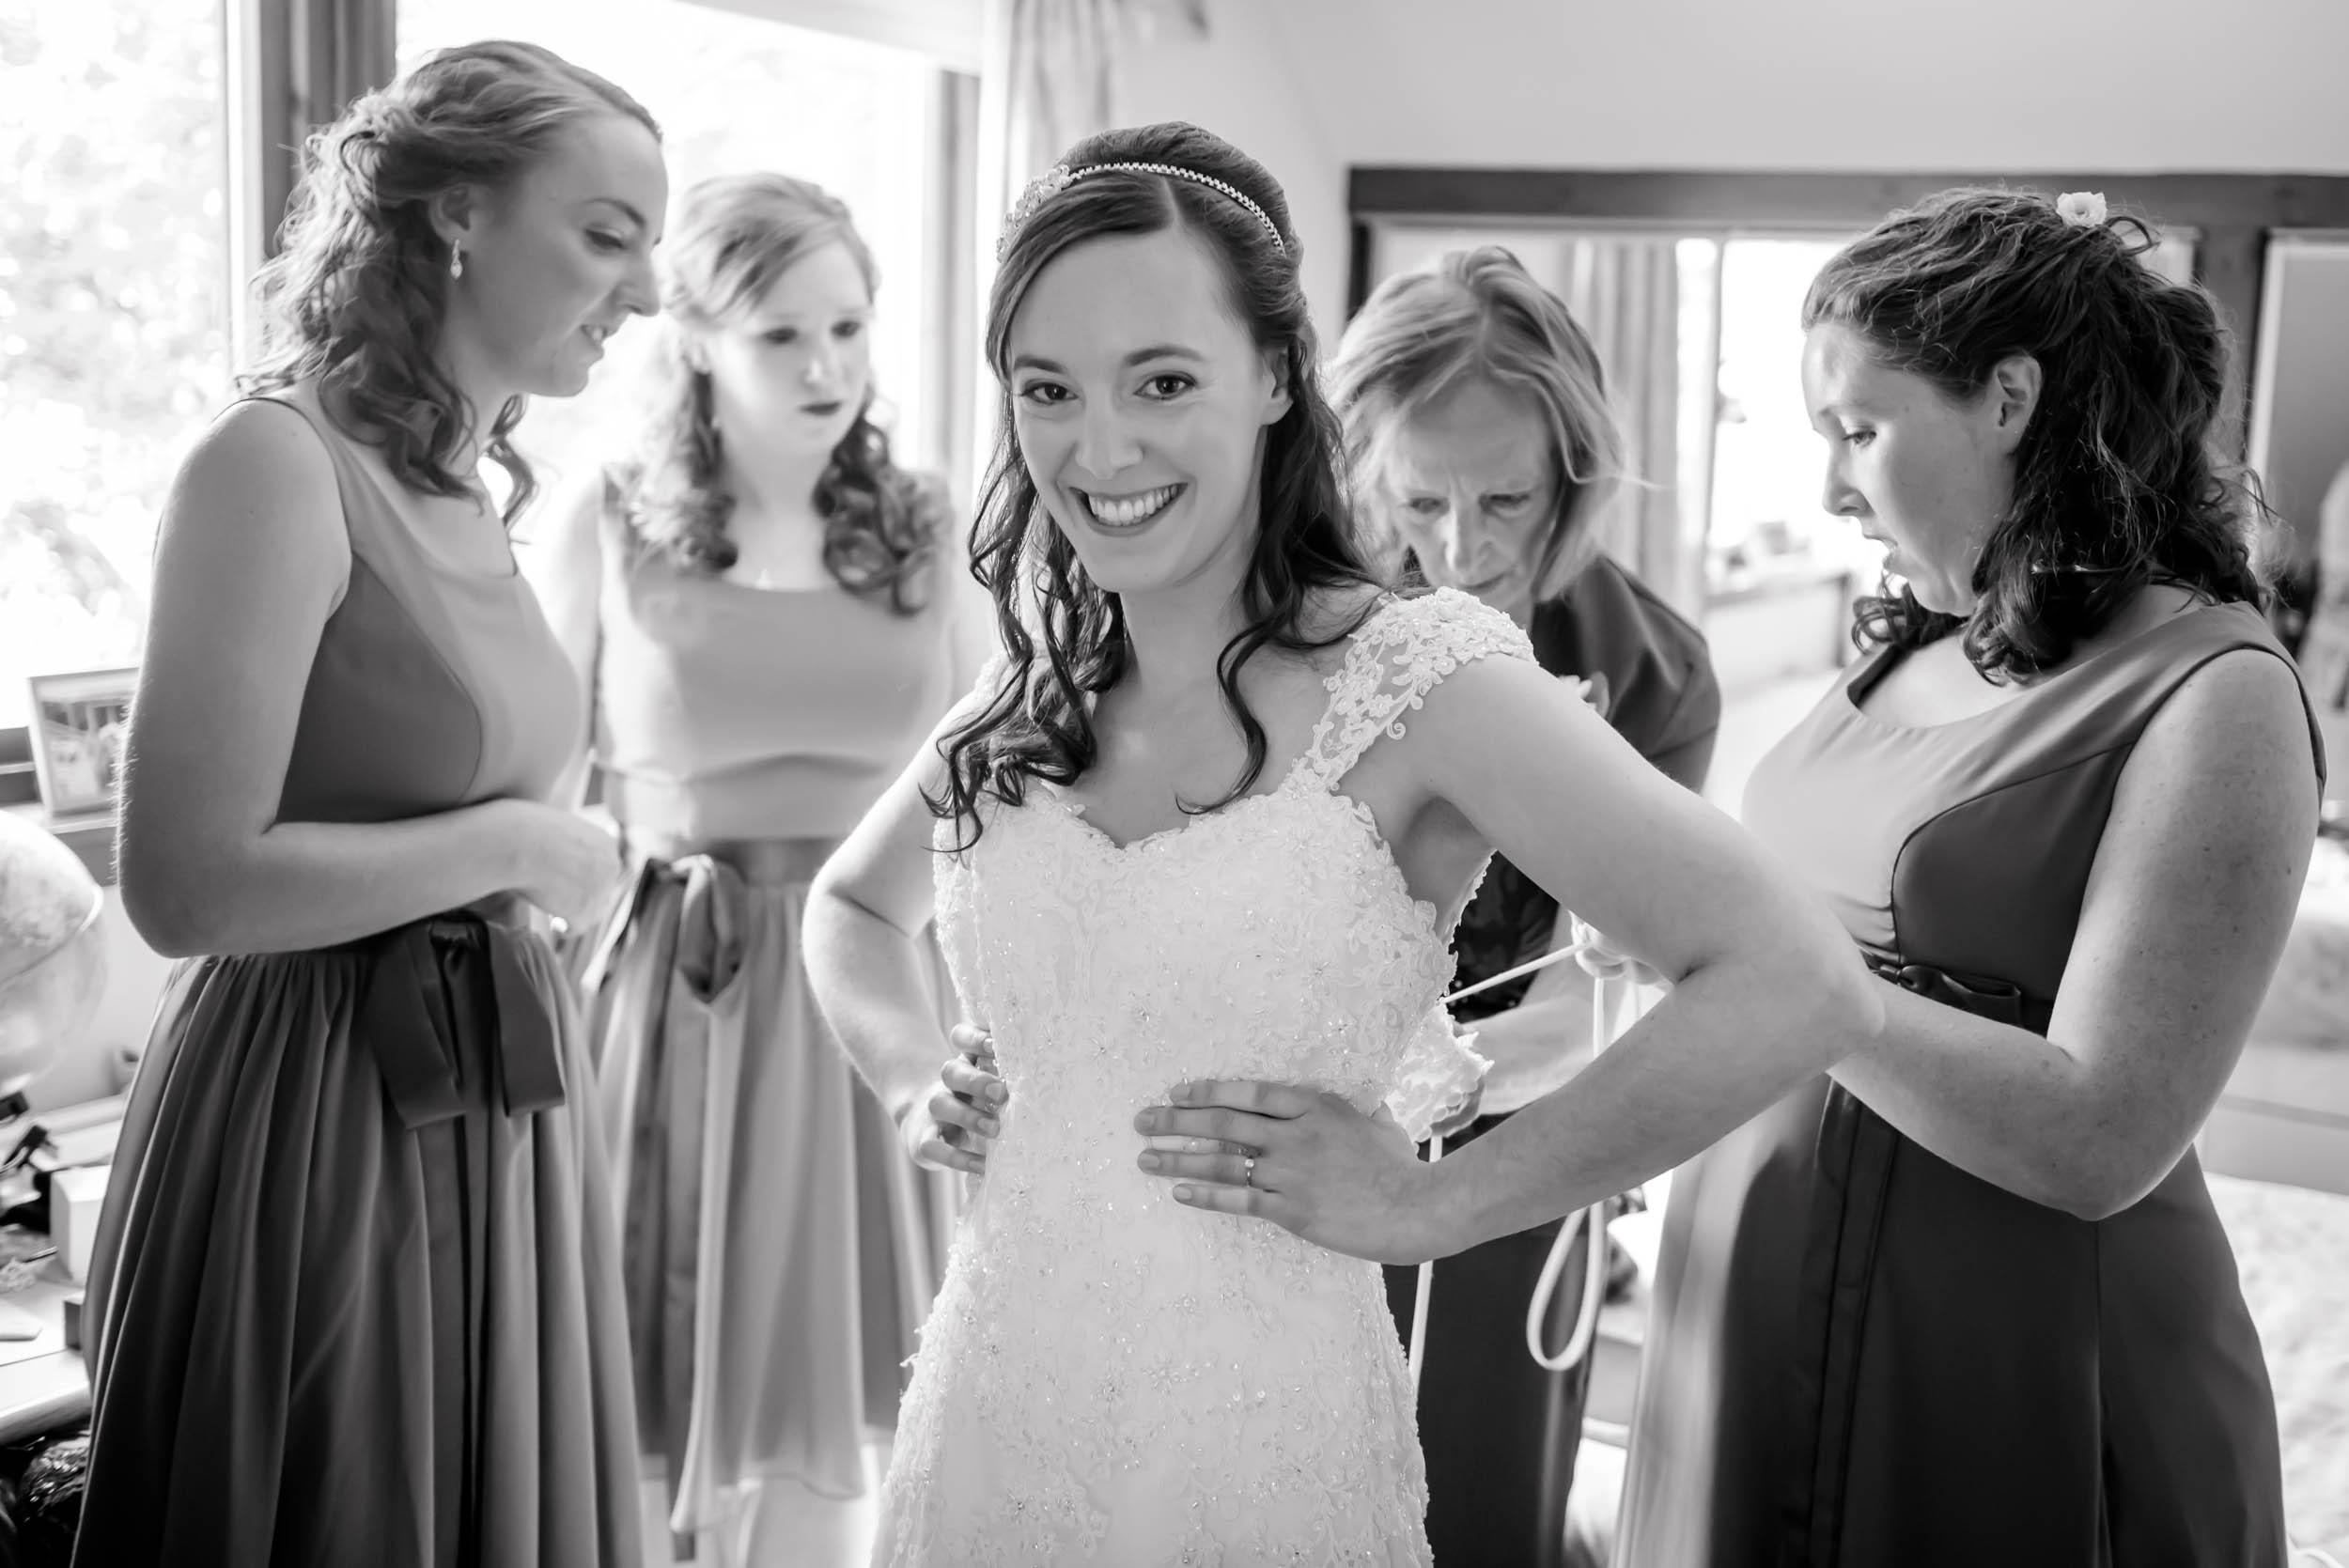 Paul-Saunders-Wedding-Photography-4739.jpg